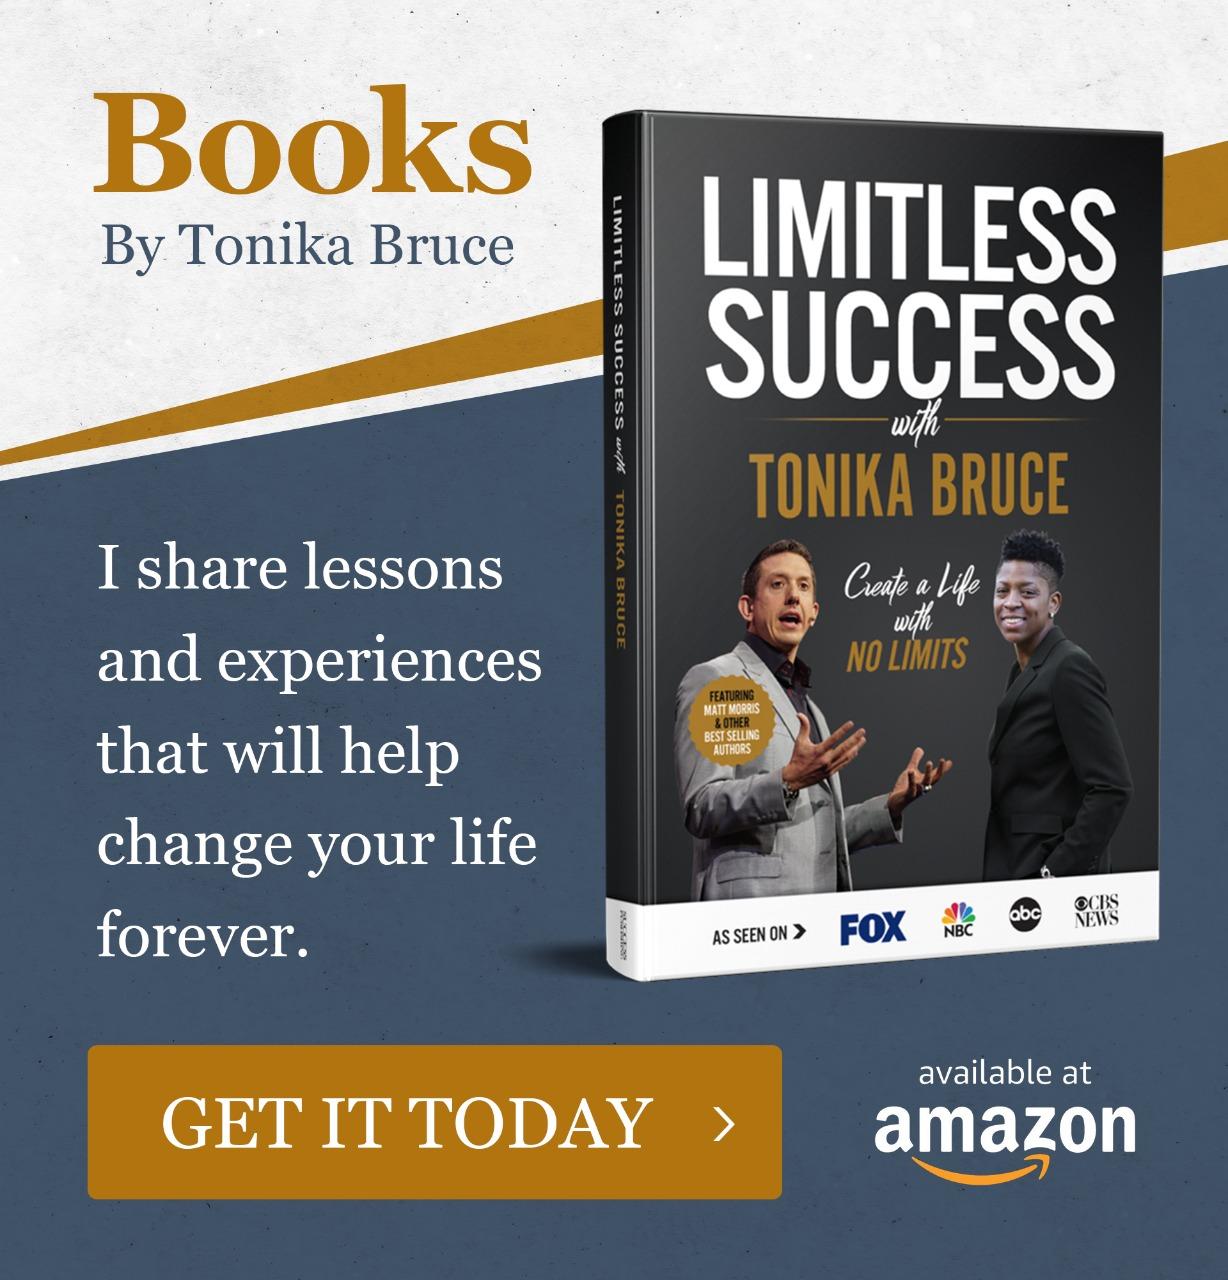 Books by Tonika Bruce